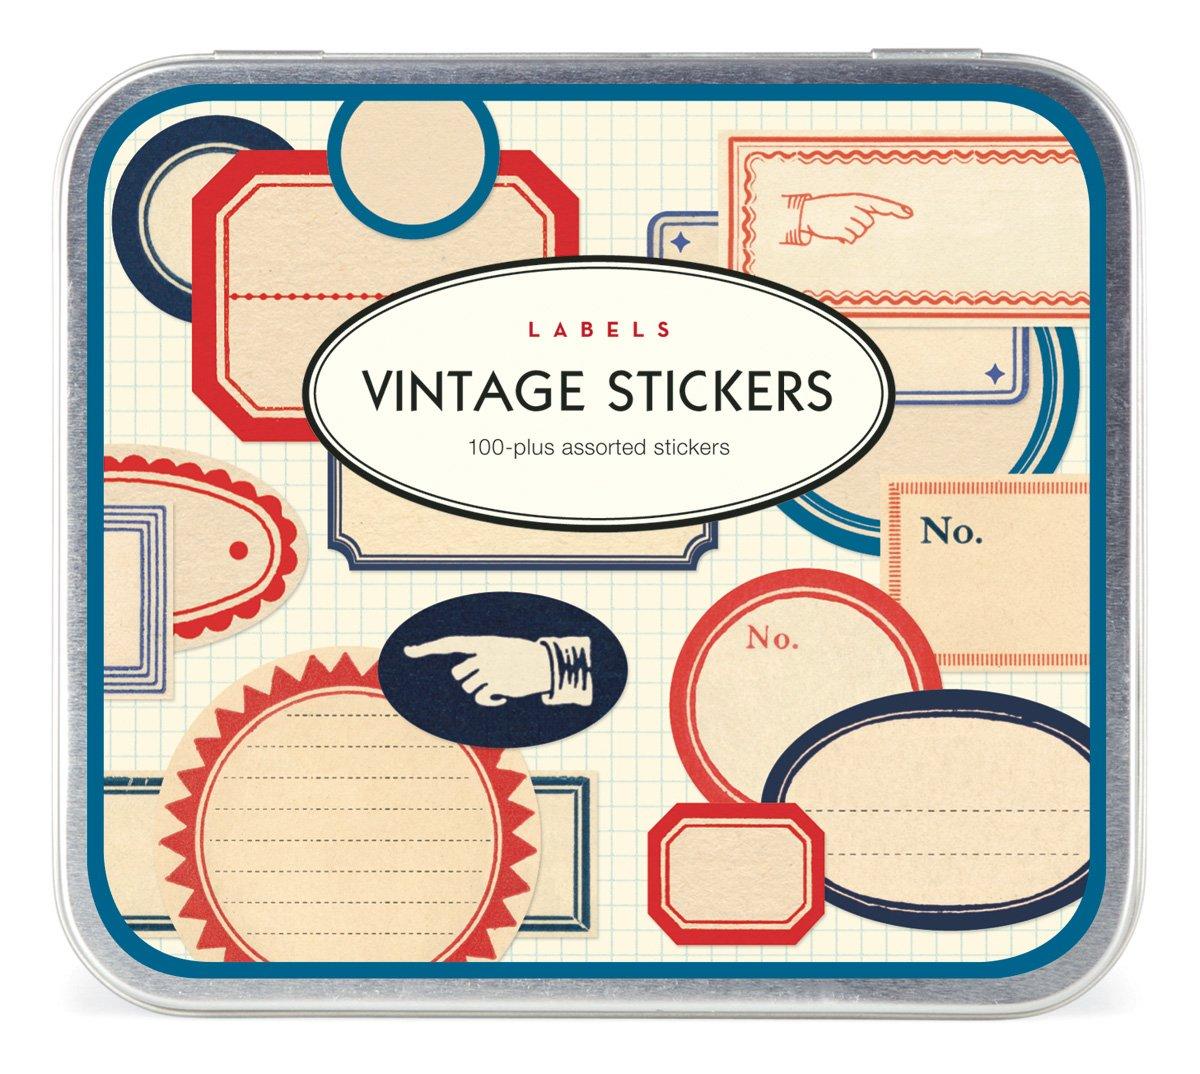 Cavallini Vintage 100 Plus Assorted Labels Stickers